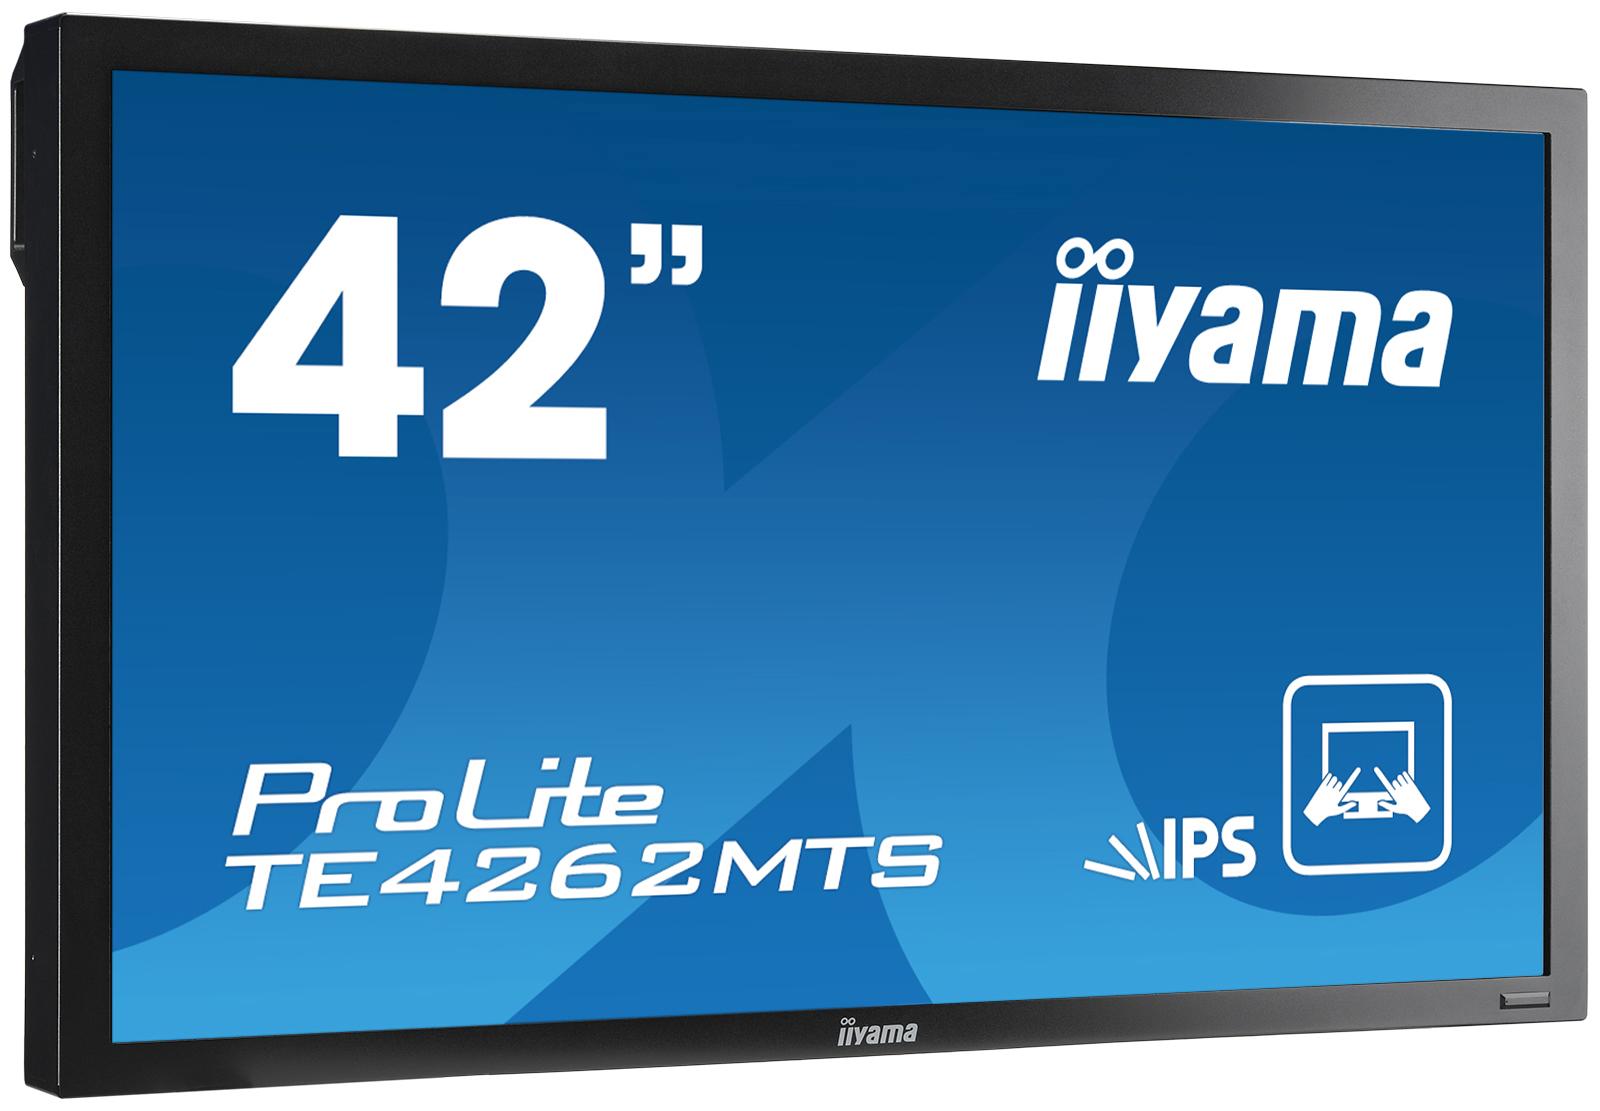 IIYAMA PL 2000 DRIVERS WINDOWS XP